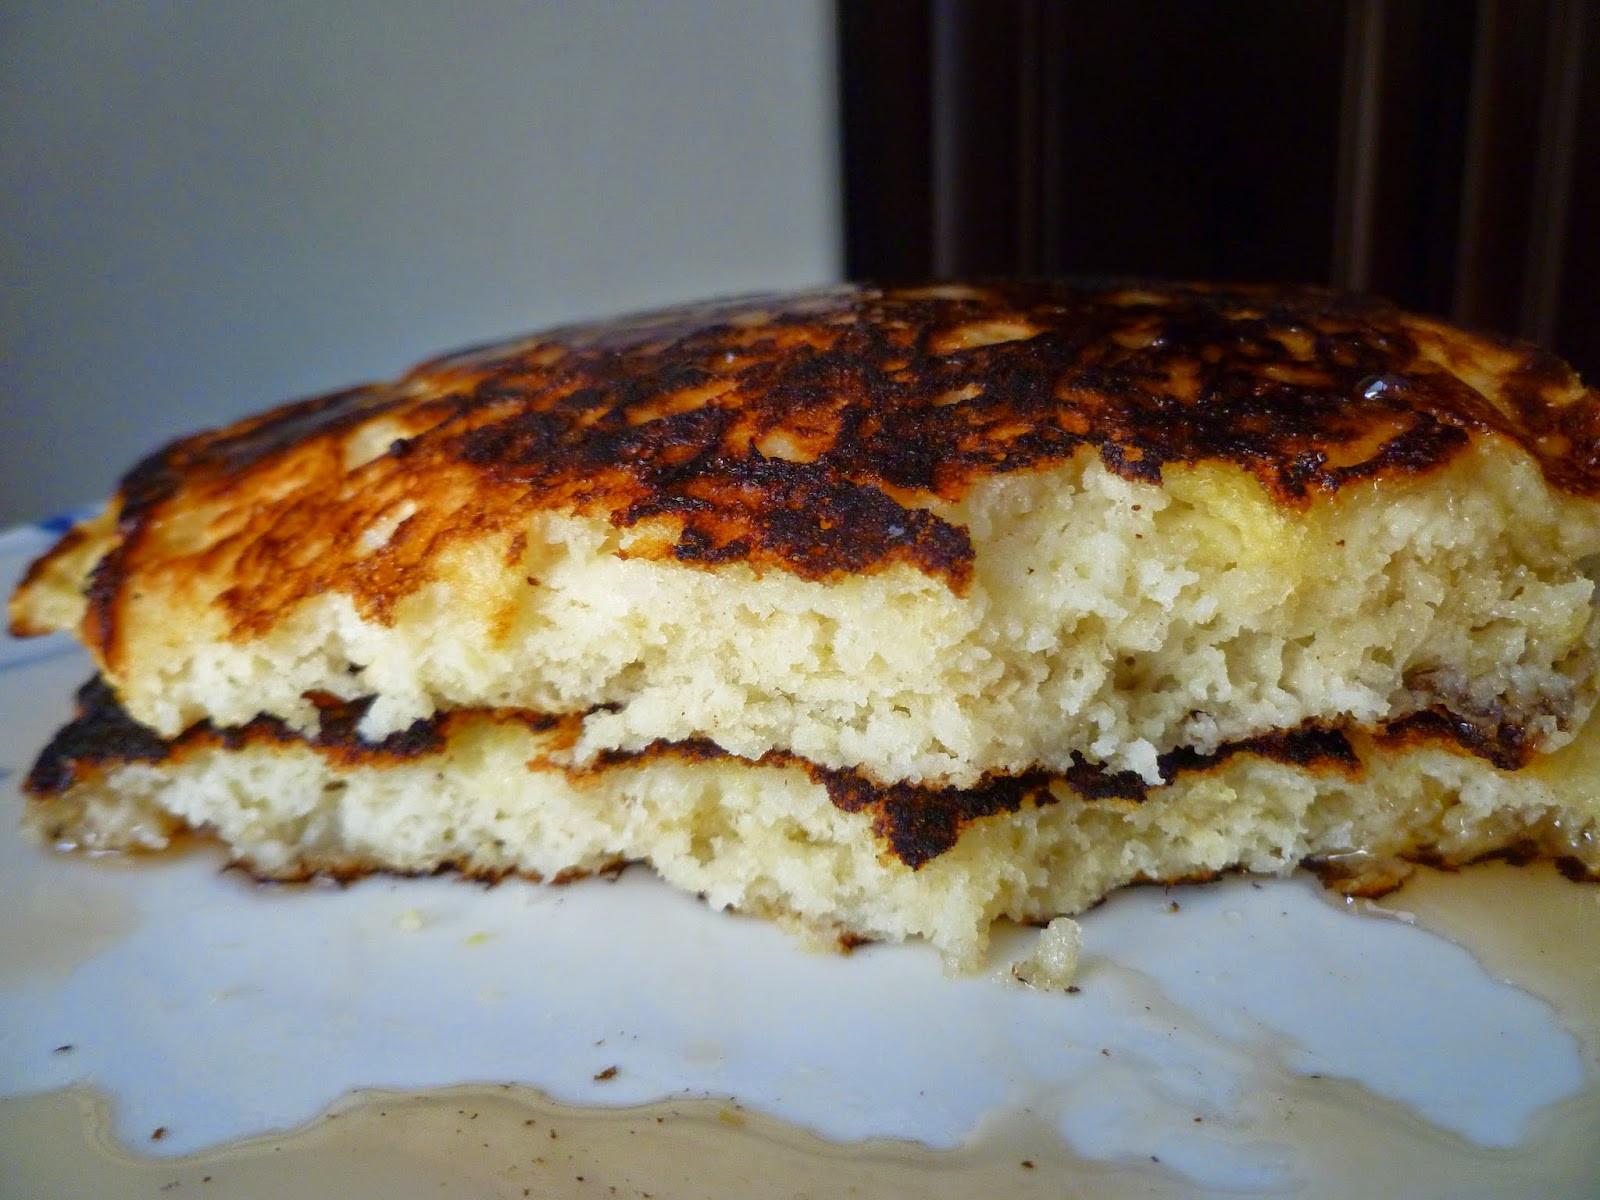 Alton Brown Pancakes  The Pastry Chef s Baking Alton Brown Pancakes